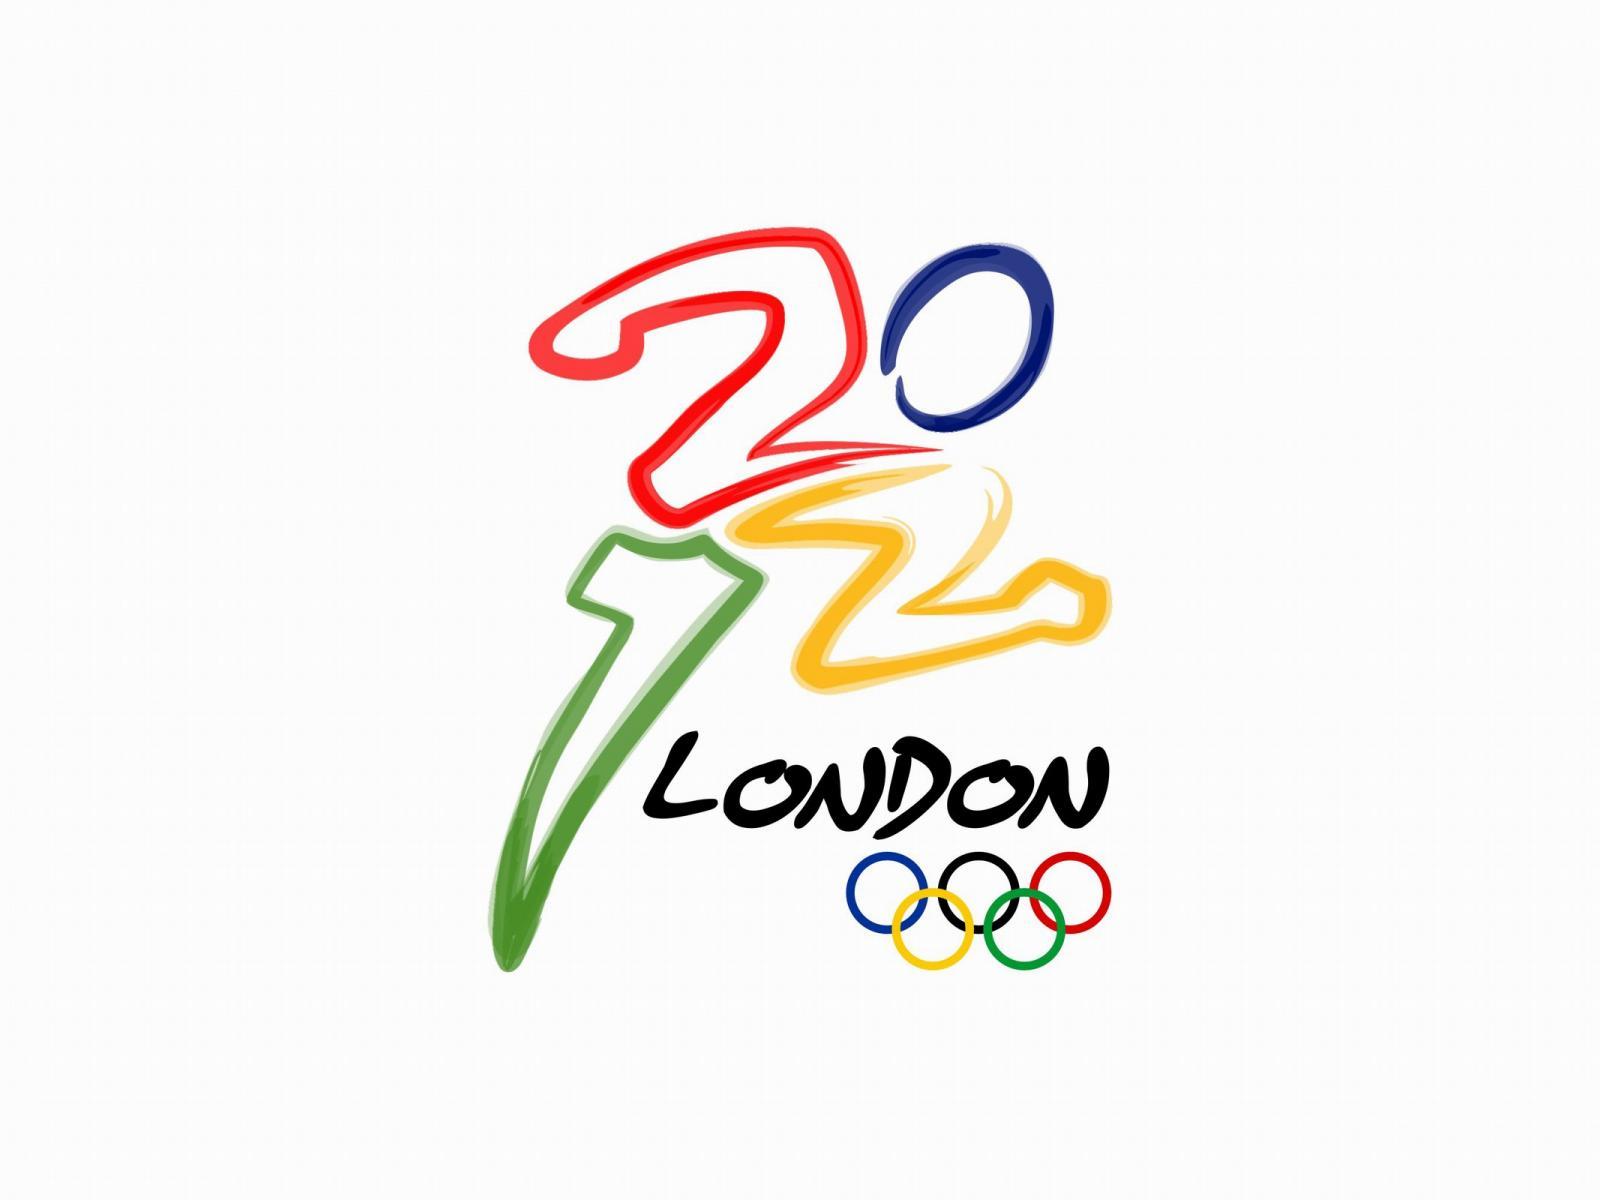 London Olympics 2012 Logo 1600x1200 DESKTOP London Olympics 2012 1600x1200